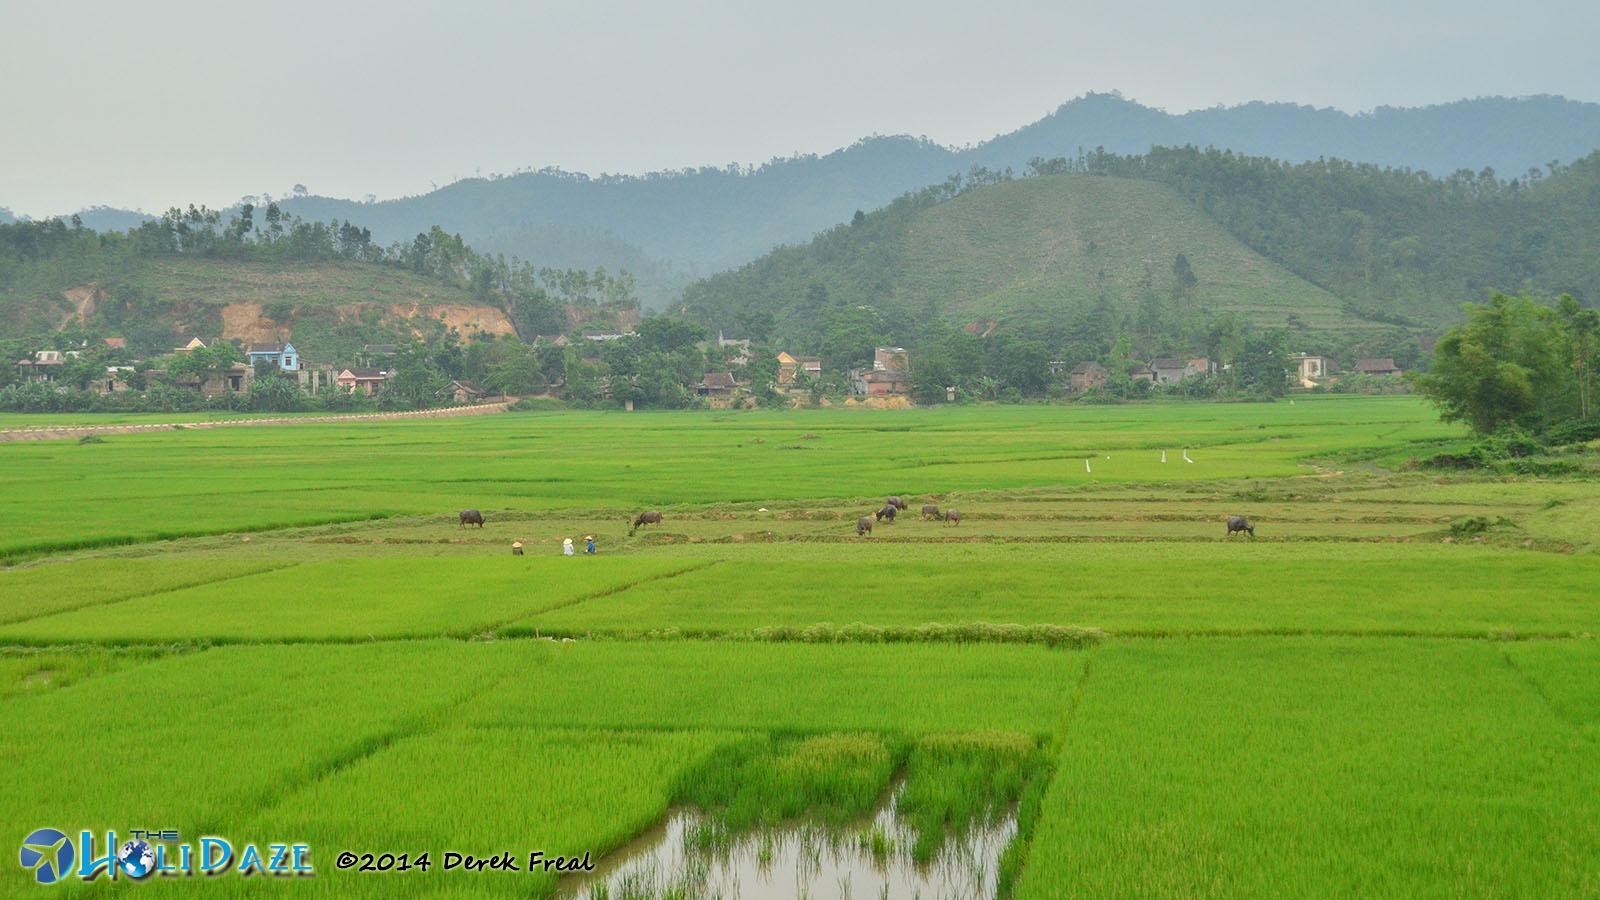 Rice paddies in Phong Nha, Vietnam